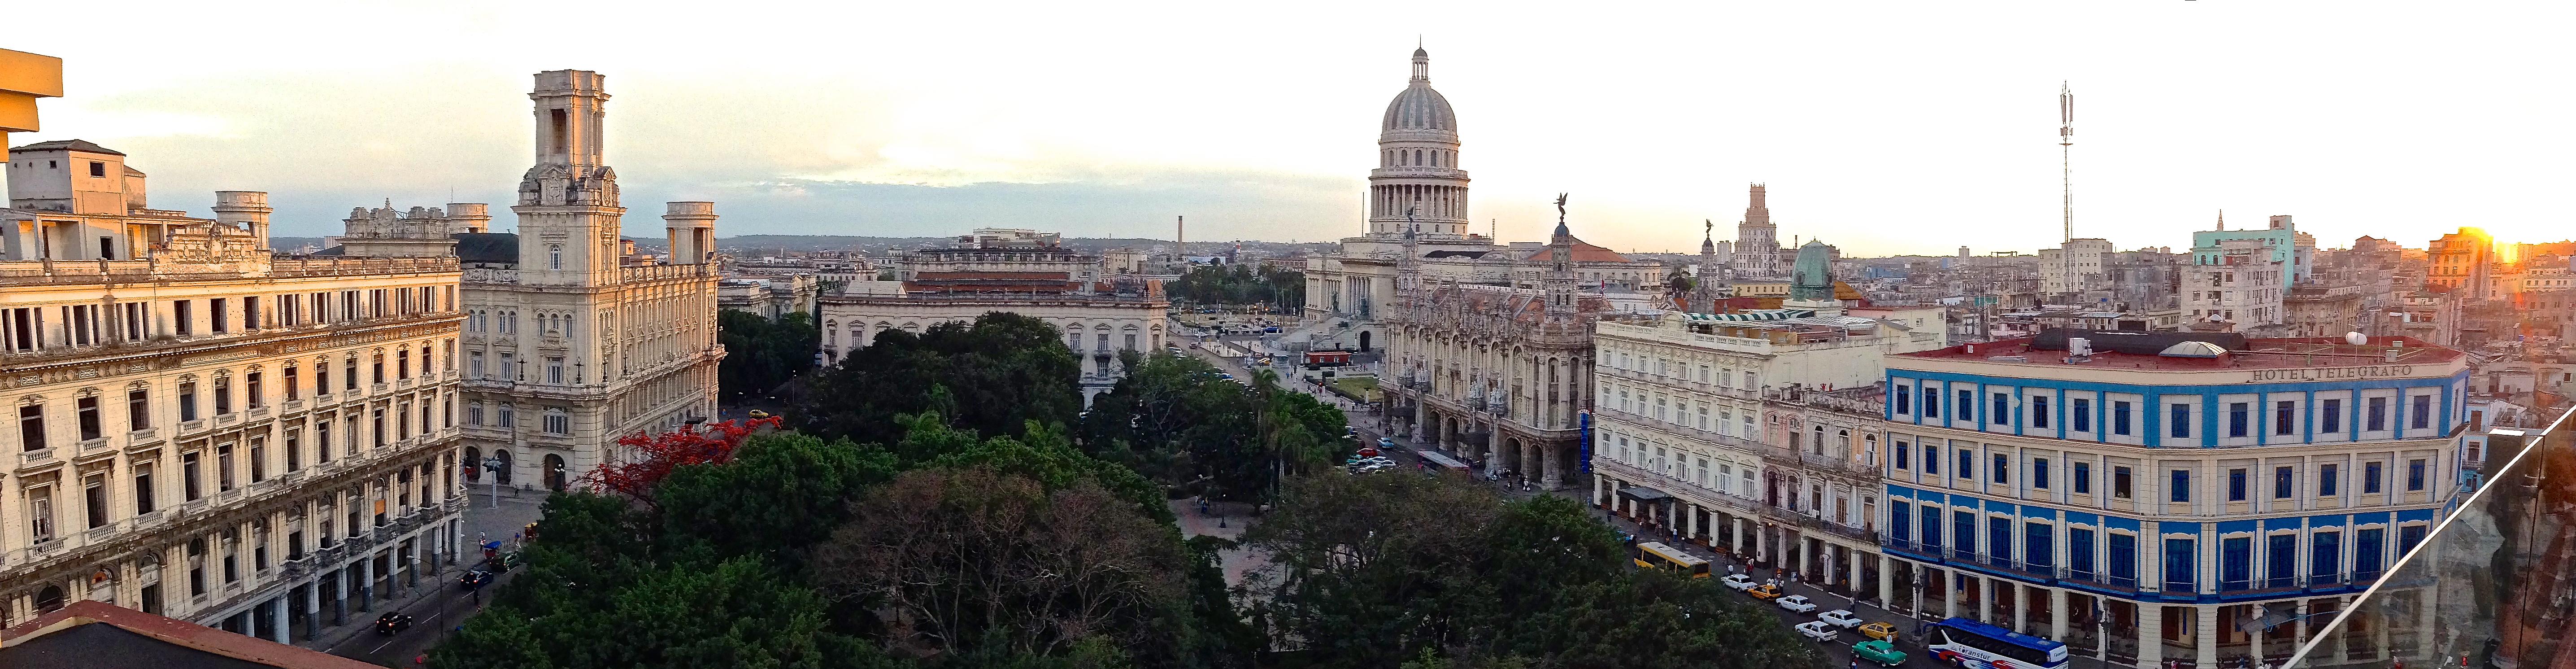 Havana Skyline - 2013